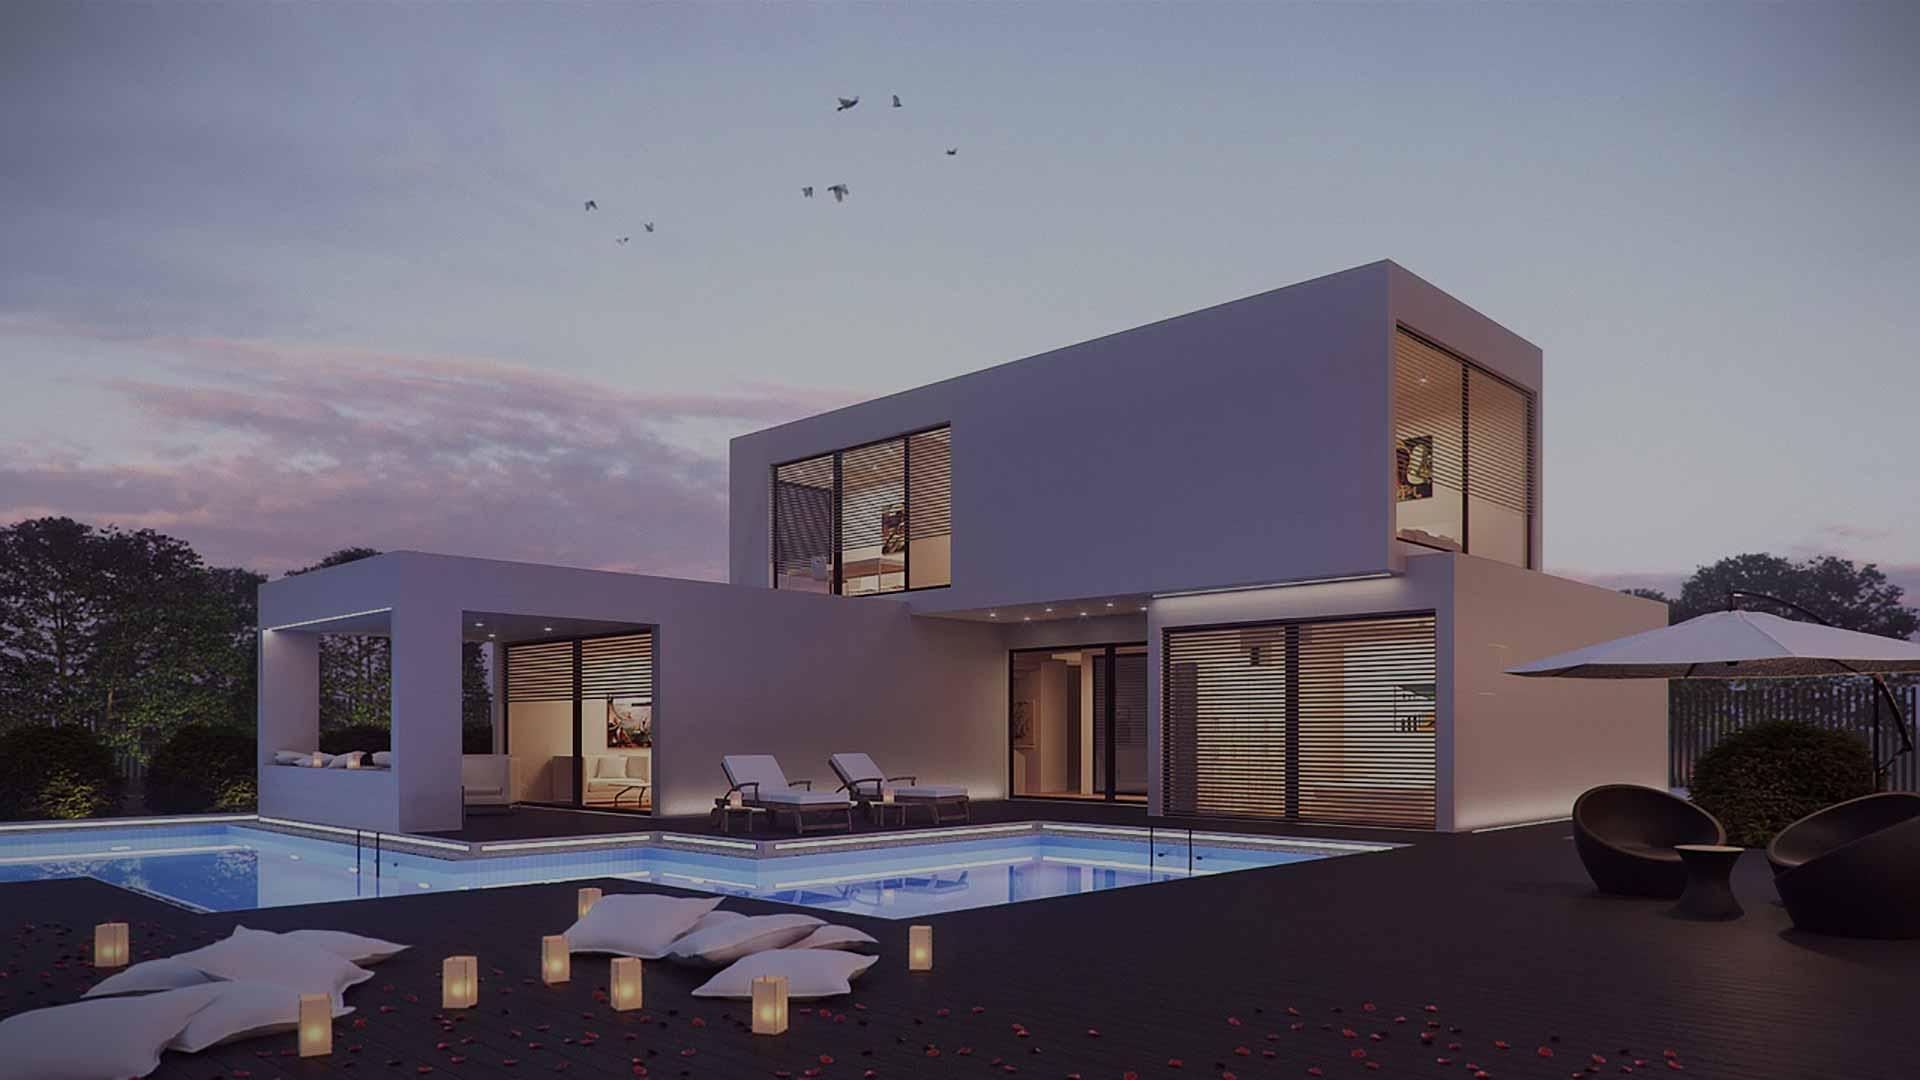 kaufelektro-architecture-1477101_1920-web